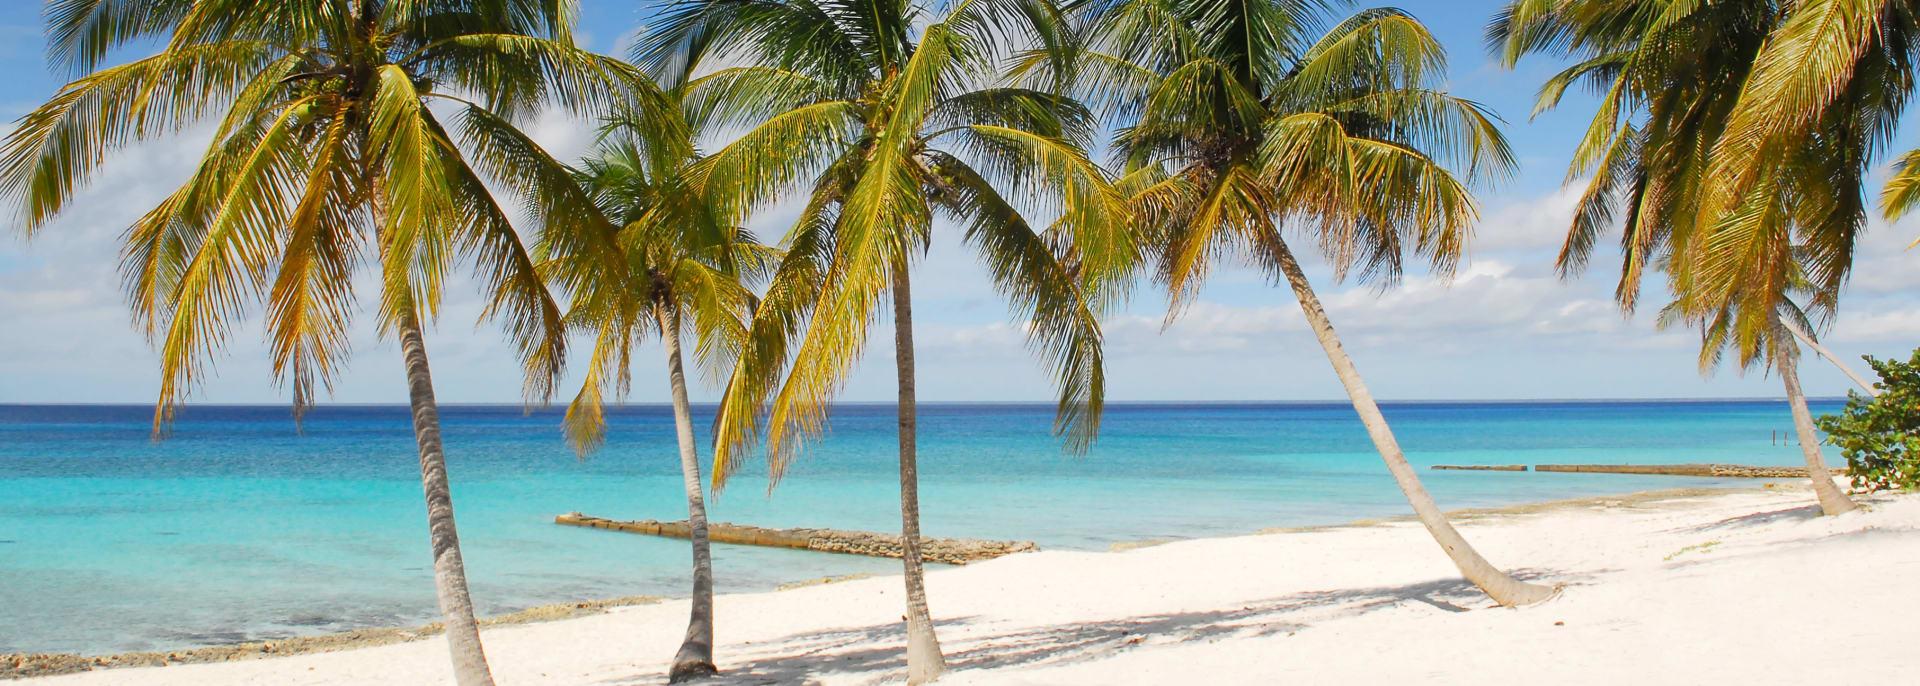 Tropical beach with white sand, palm-trees and blue ocean on Maria la Gorda, Cuba